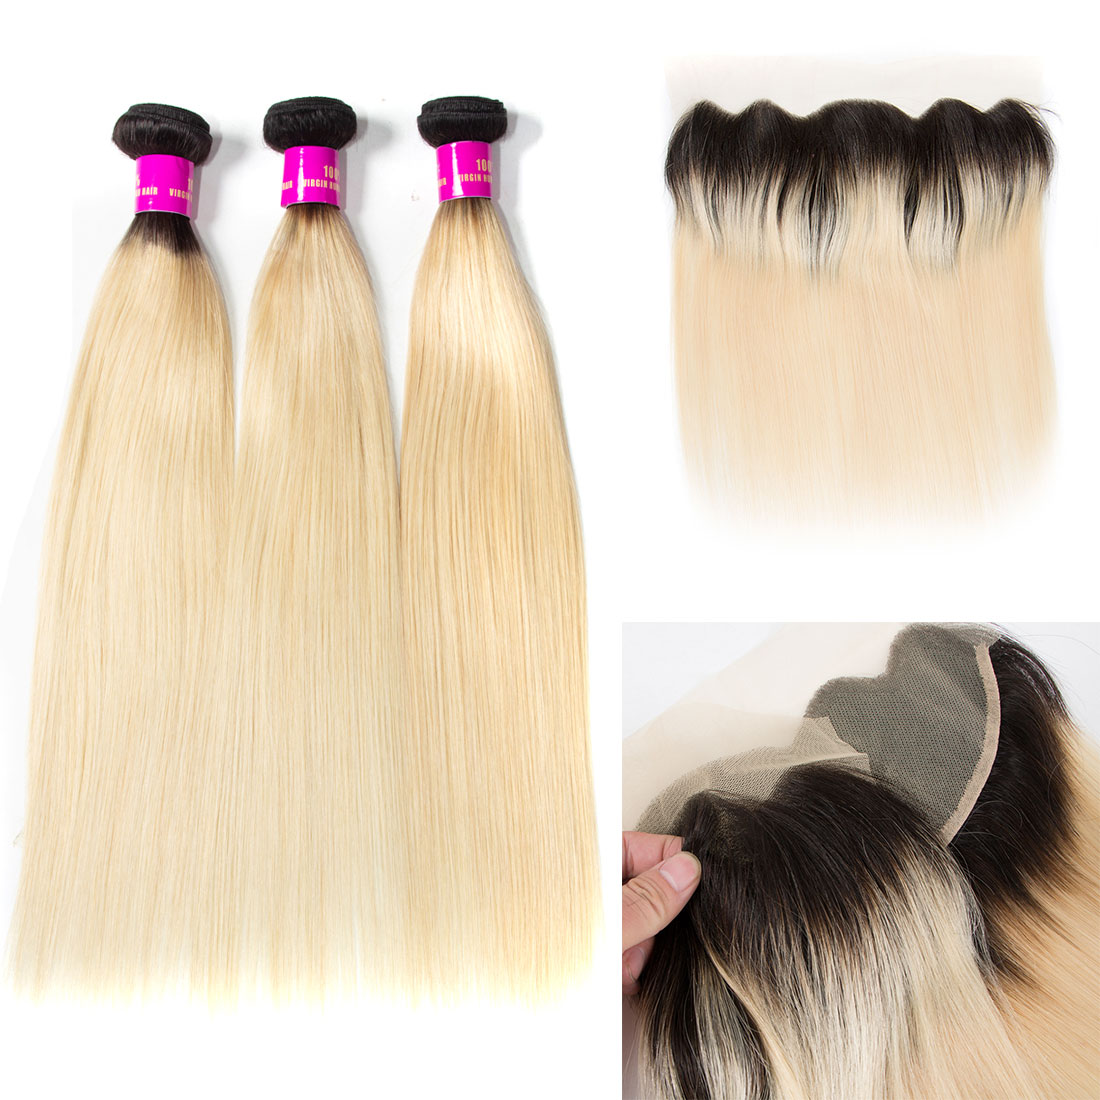 Tinashe-hair-1b-613-blonde-straight-hair-3-bundles-with-frontal